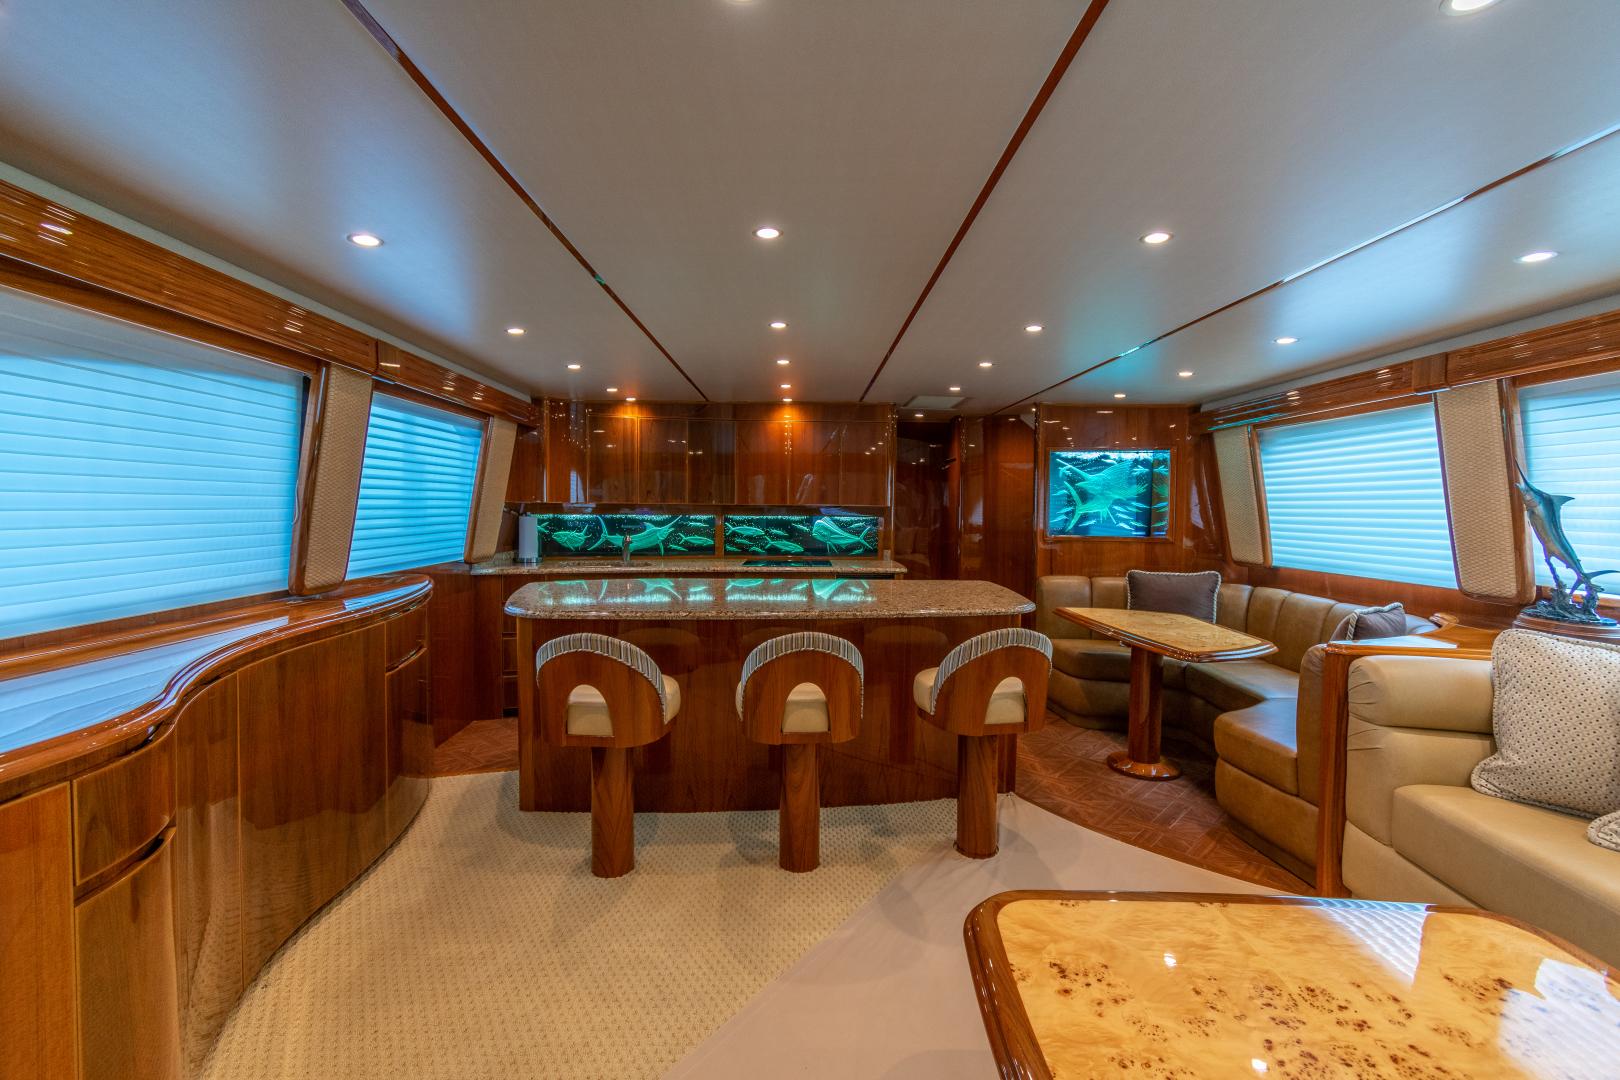 Viking-70 Convertible 2014-Load N Go Port Aransas-Texas-United States-2014 70 Viking Load N Go Salon (2)-1380503 | Thumbnail